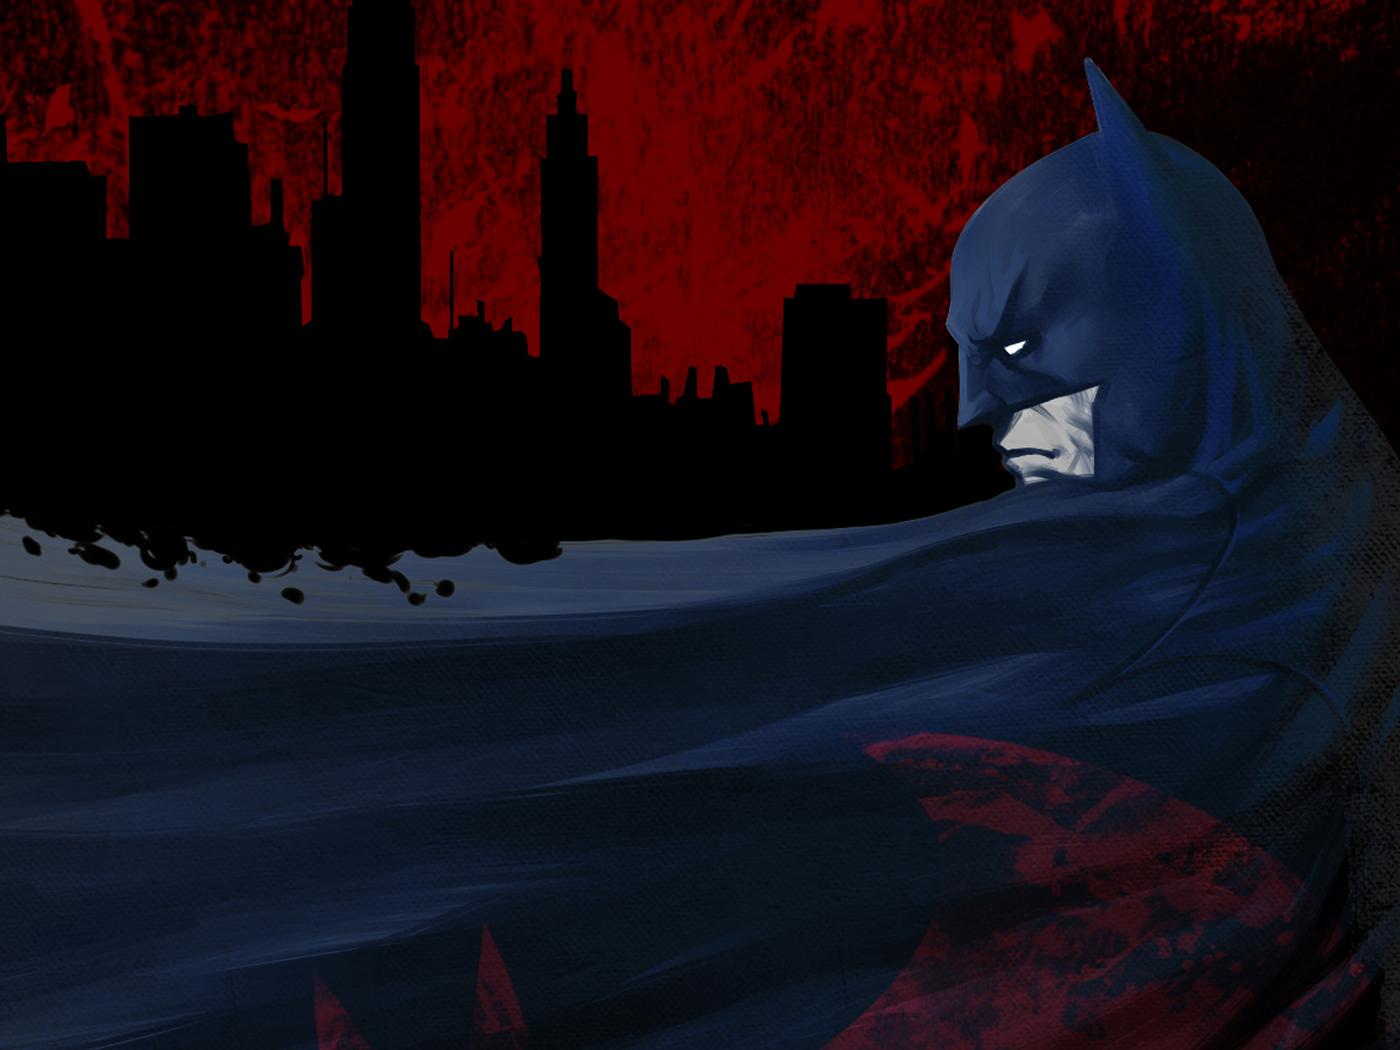 batman-gotham-artwork-ar.jpg